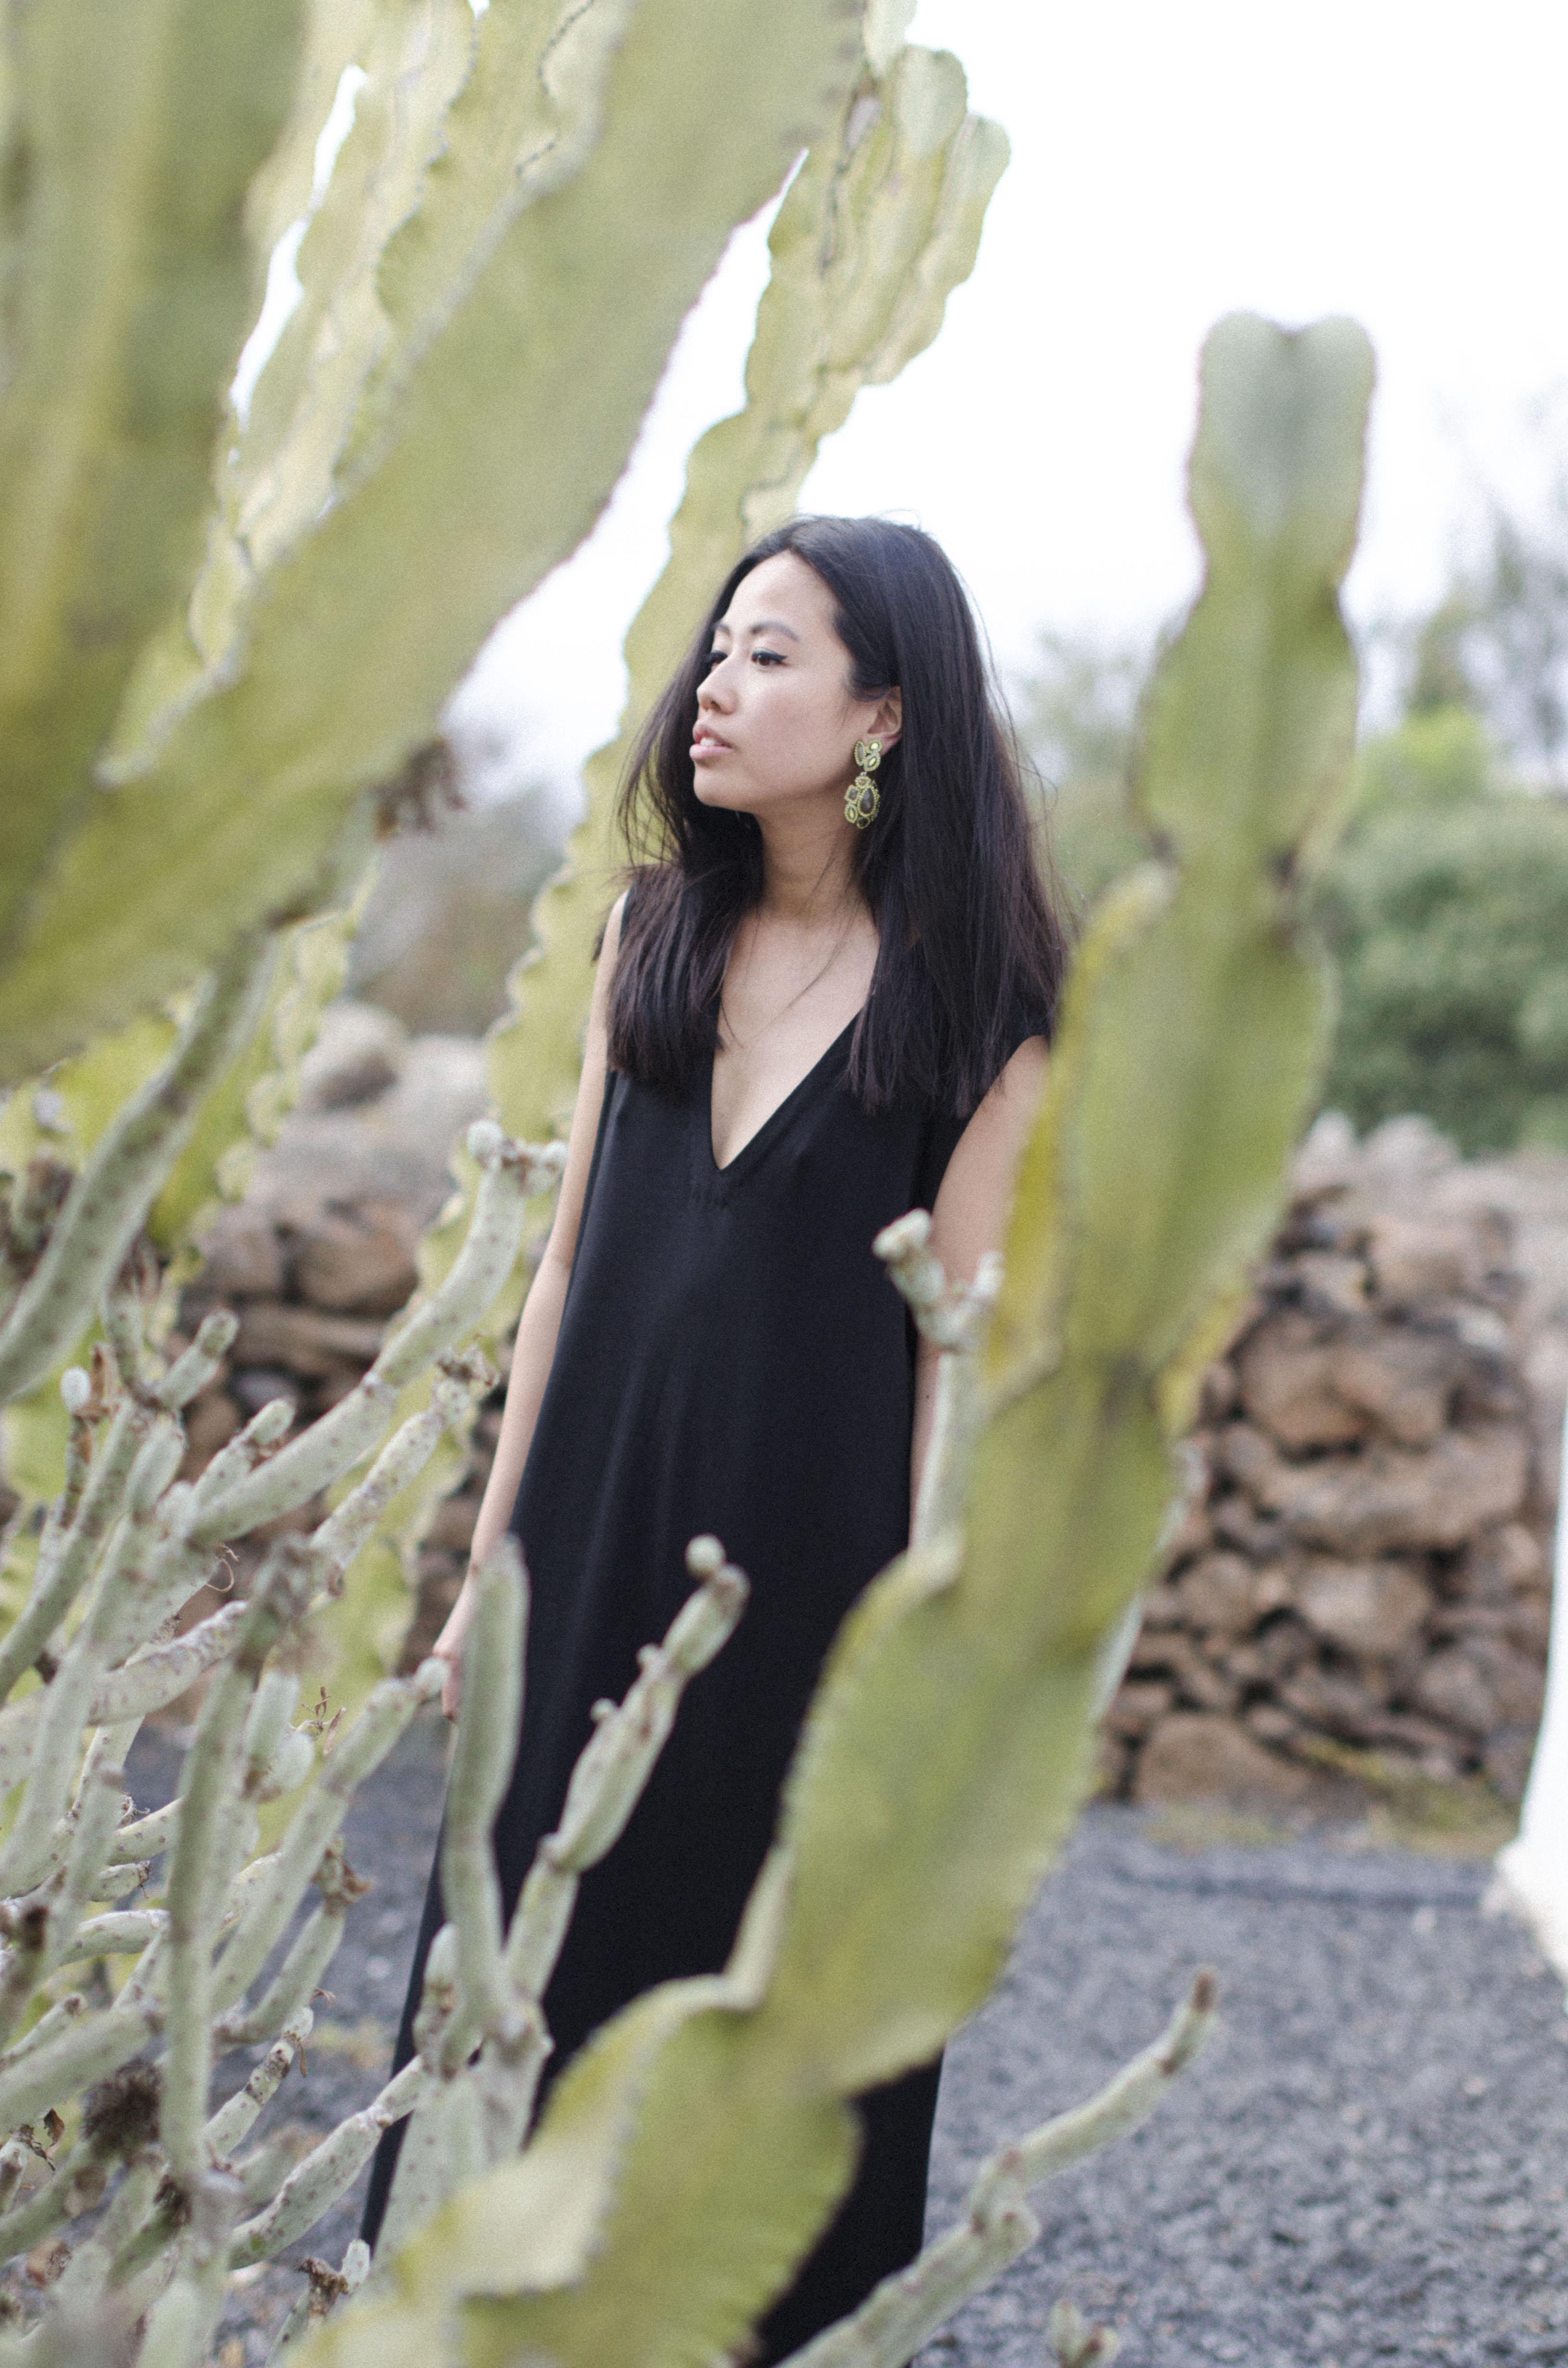 IHEARTALICE_cactus_01